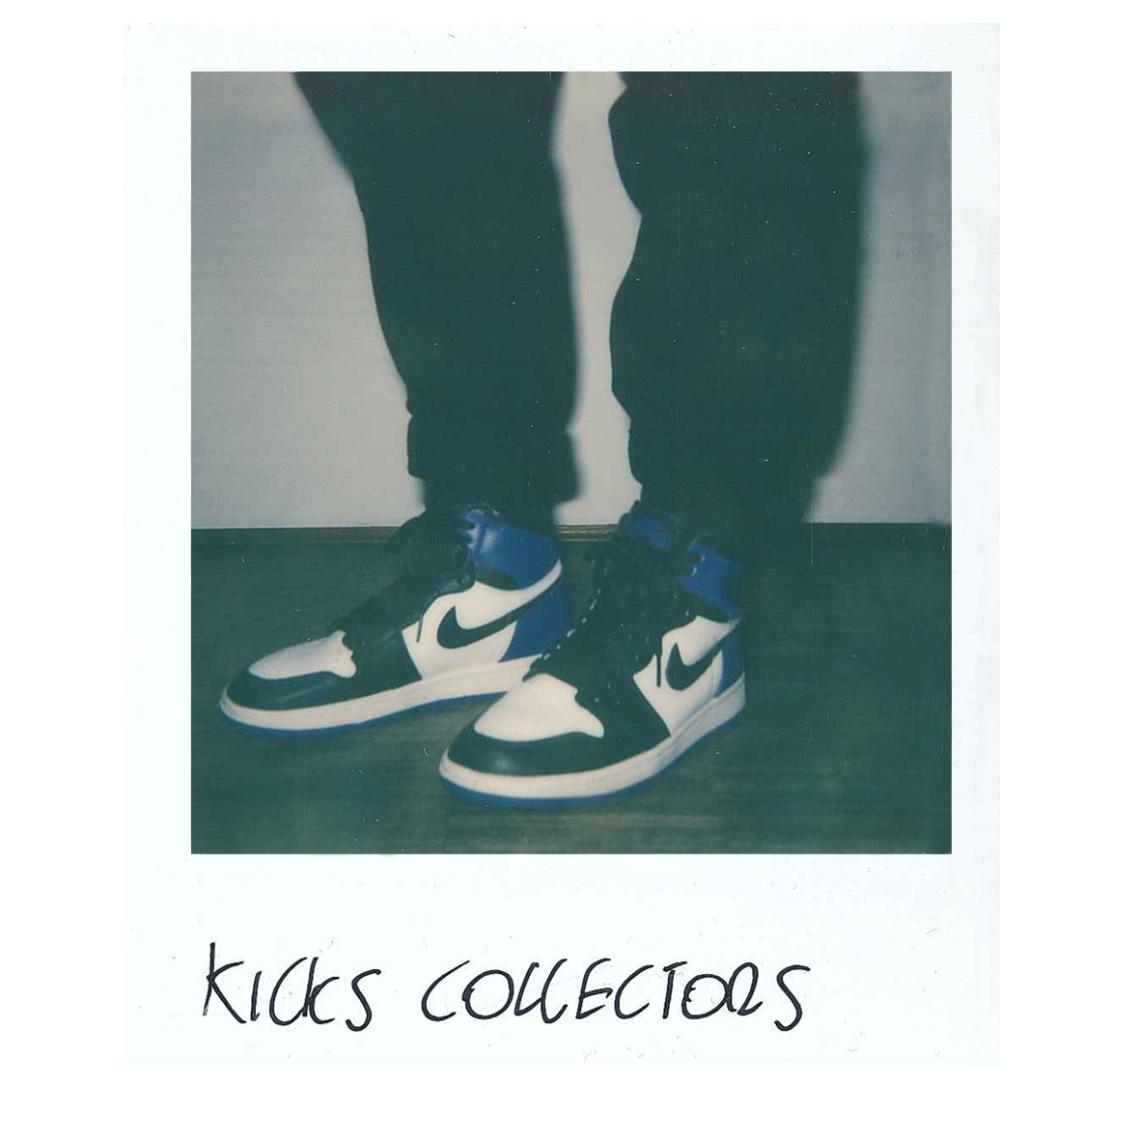 2-kicks-collectors-2-fragment-design-x-air-jordan-1.jpg